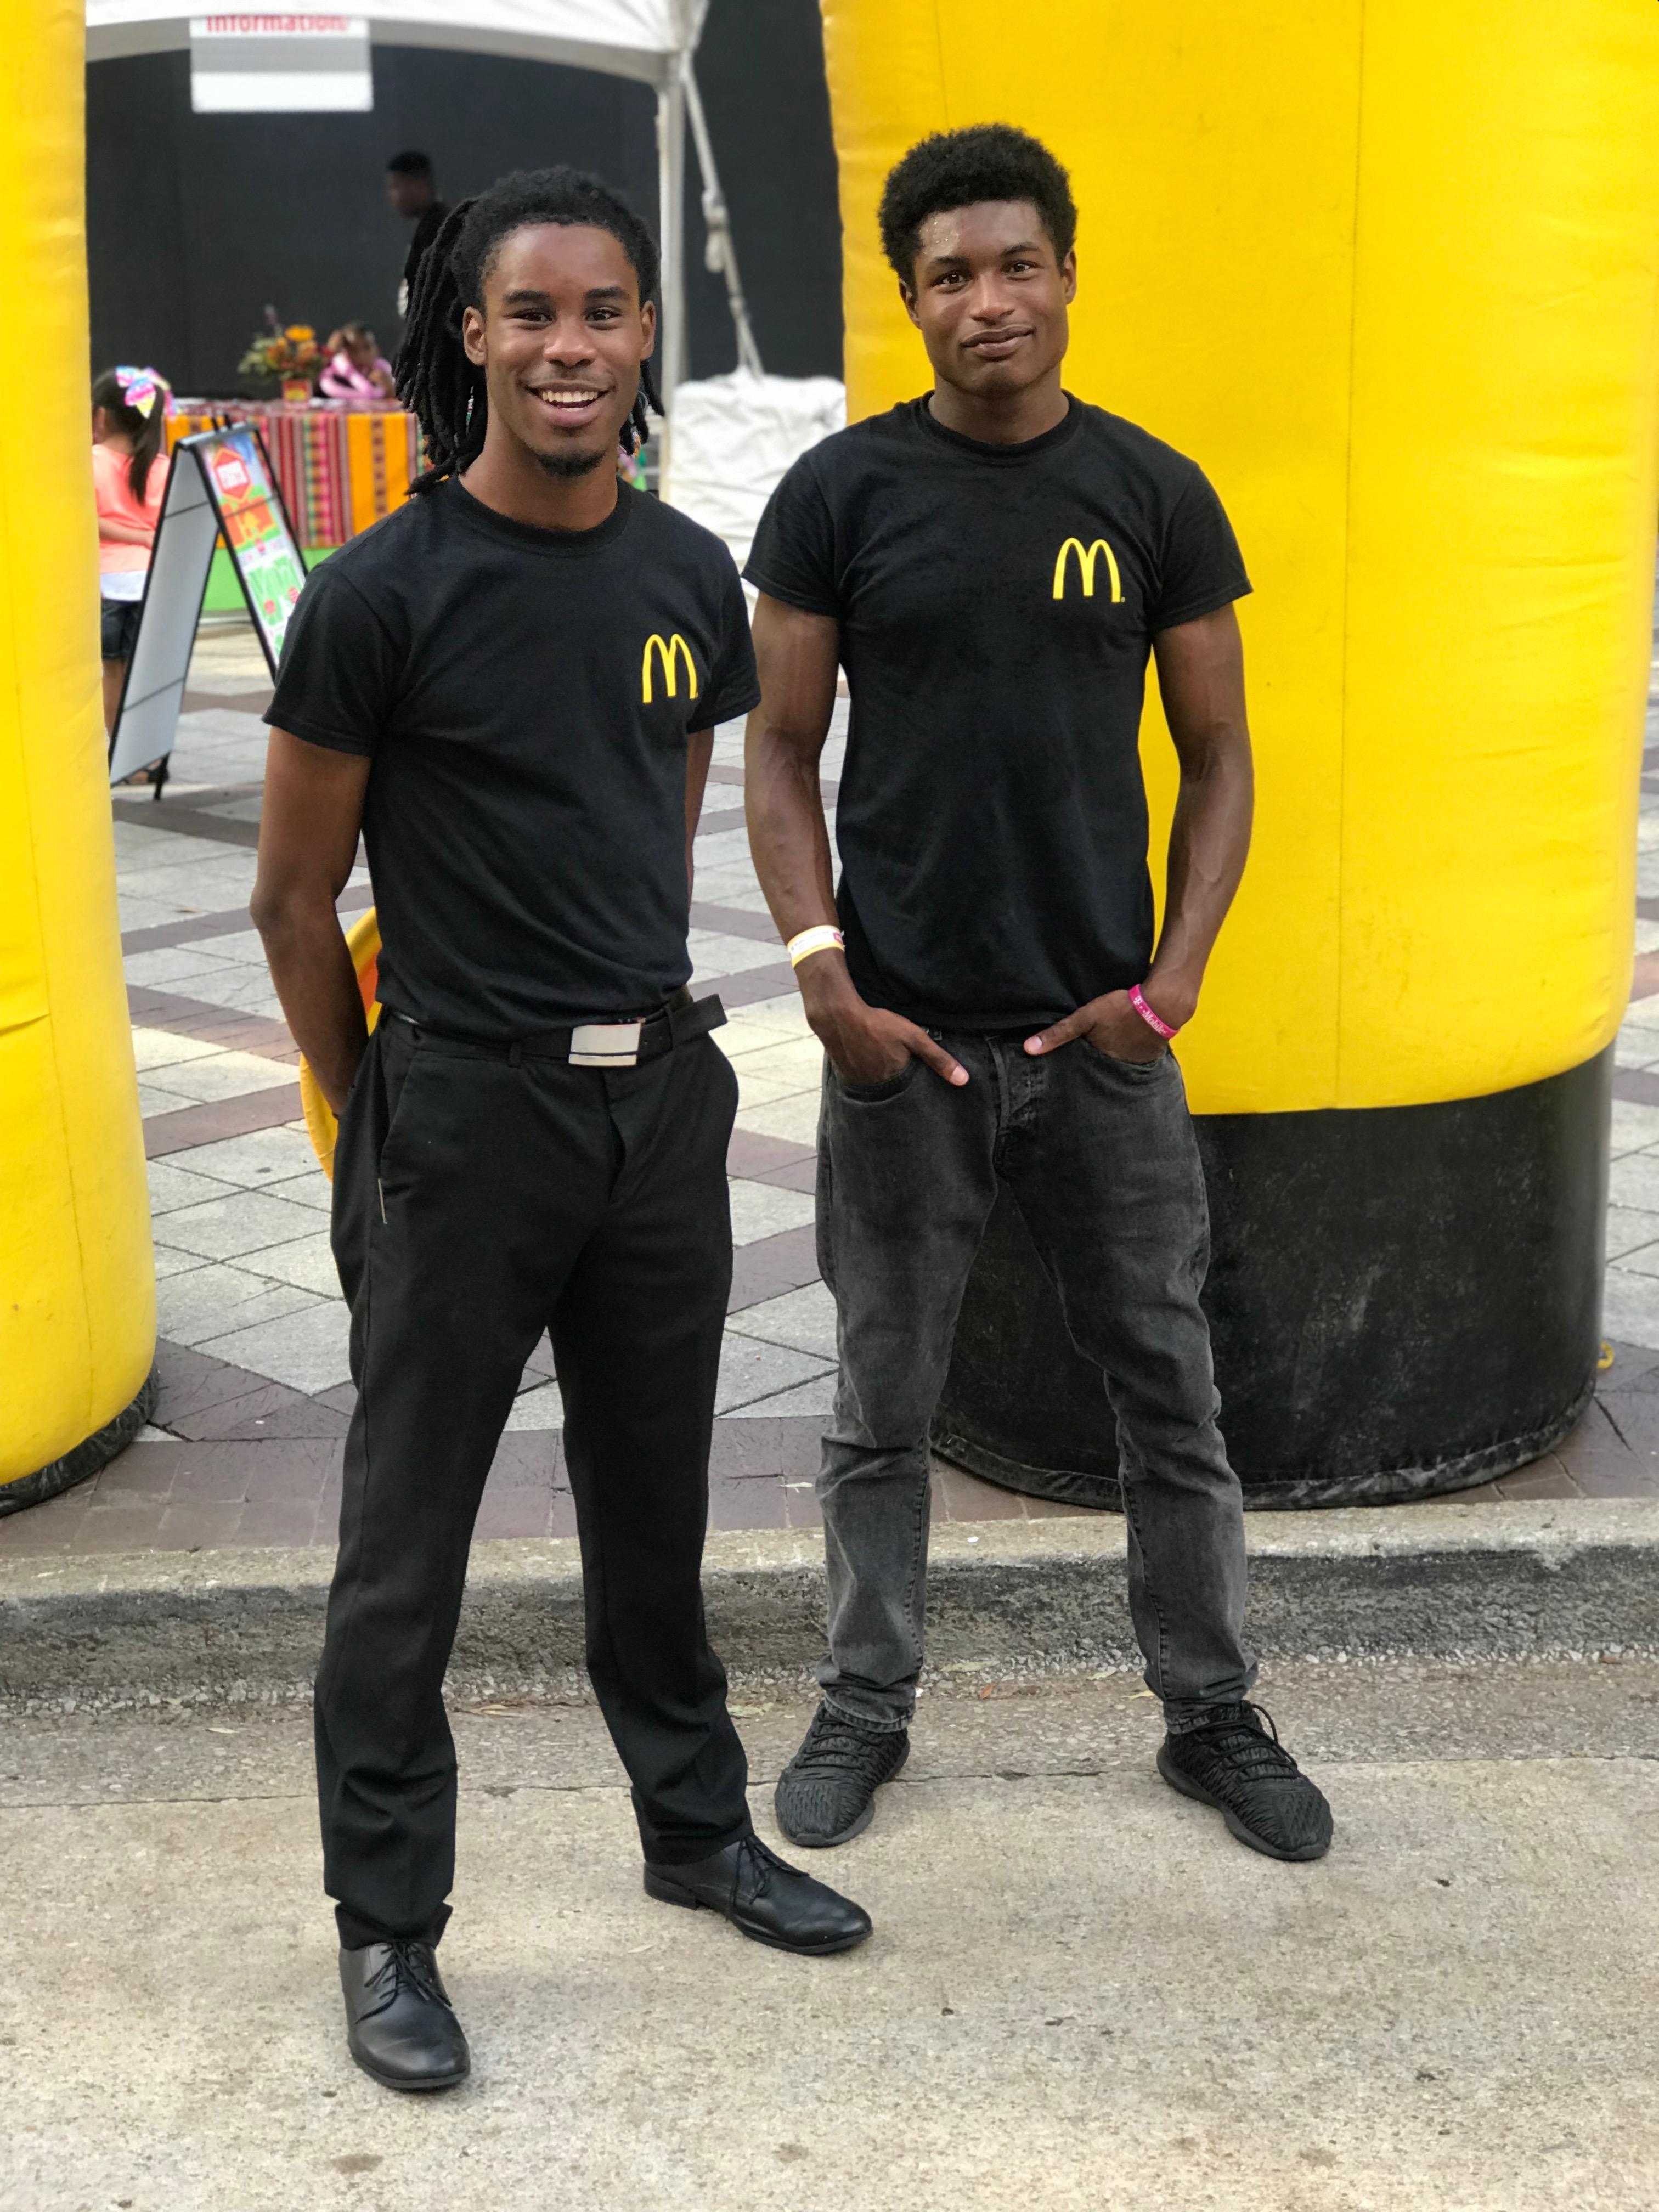 McDonald's Promotional Model